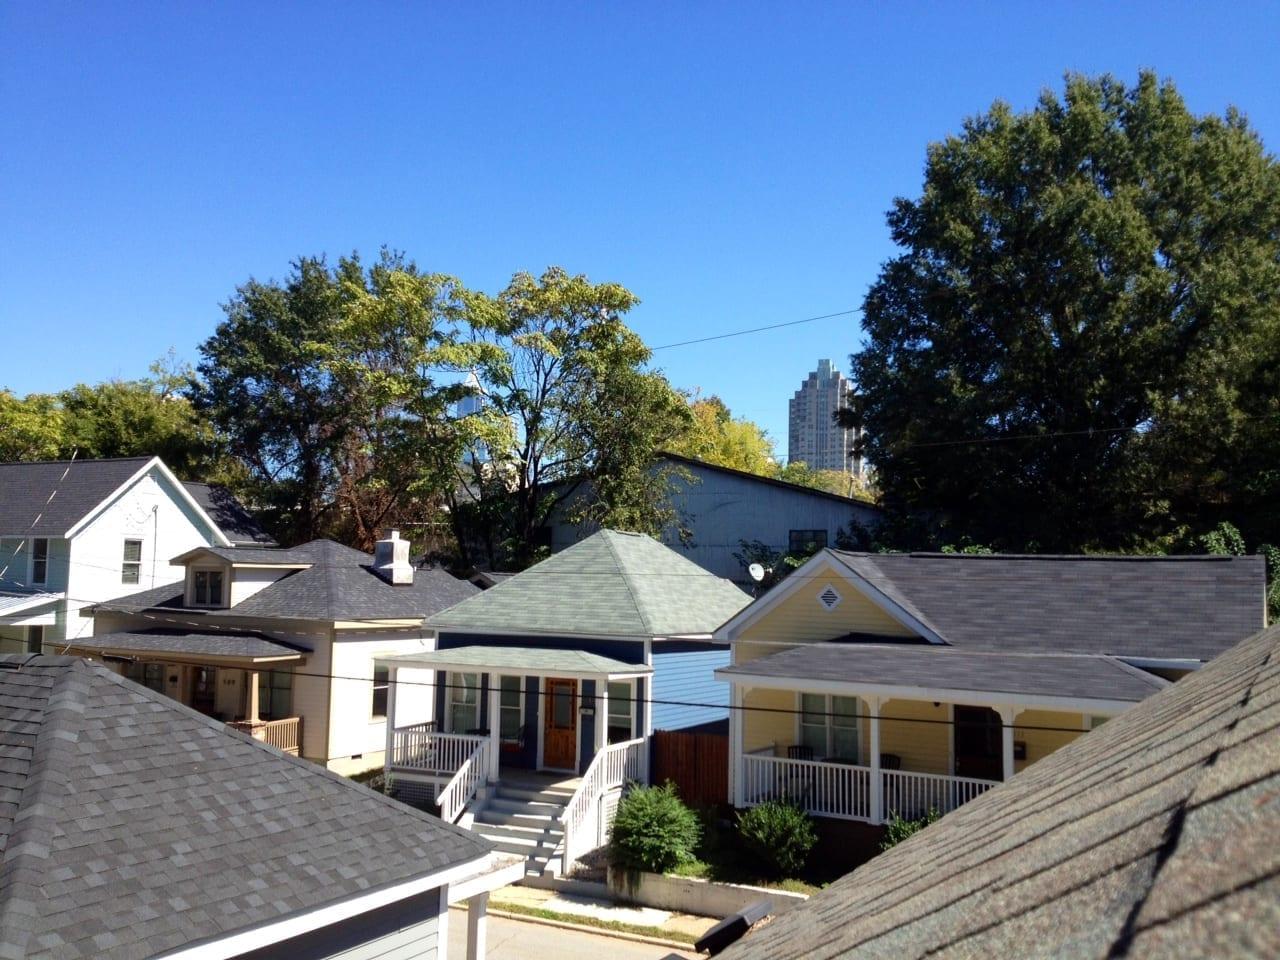 A neighborhood transformed